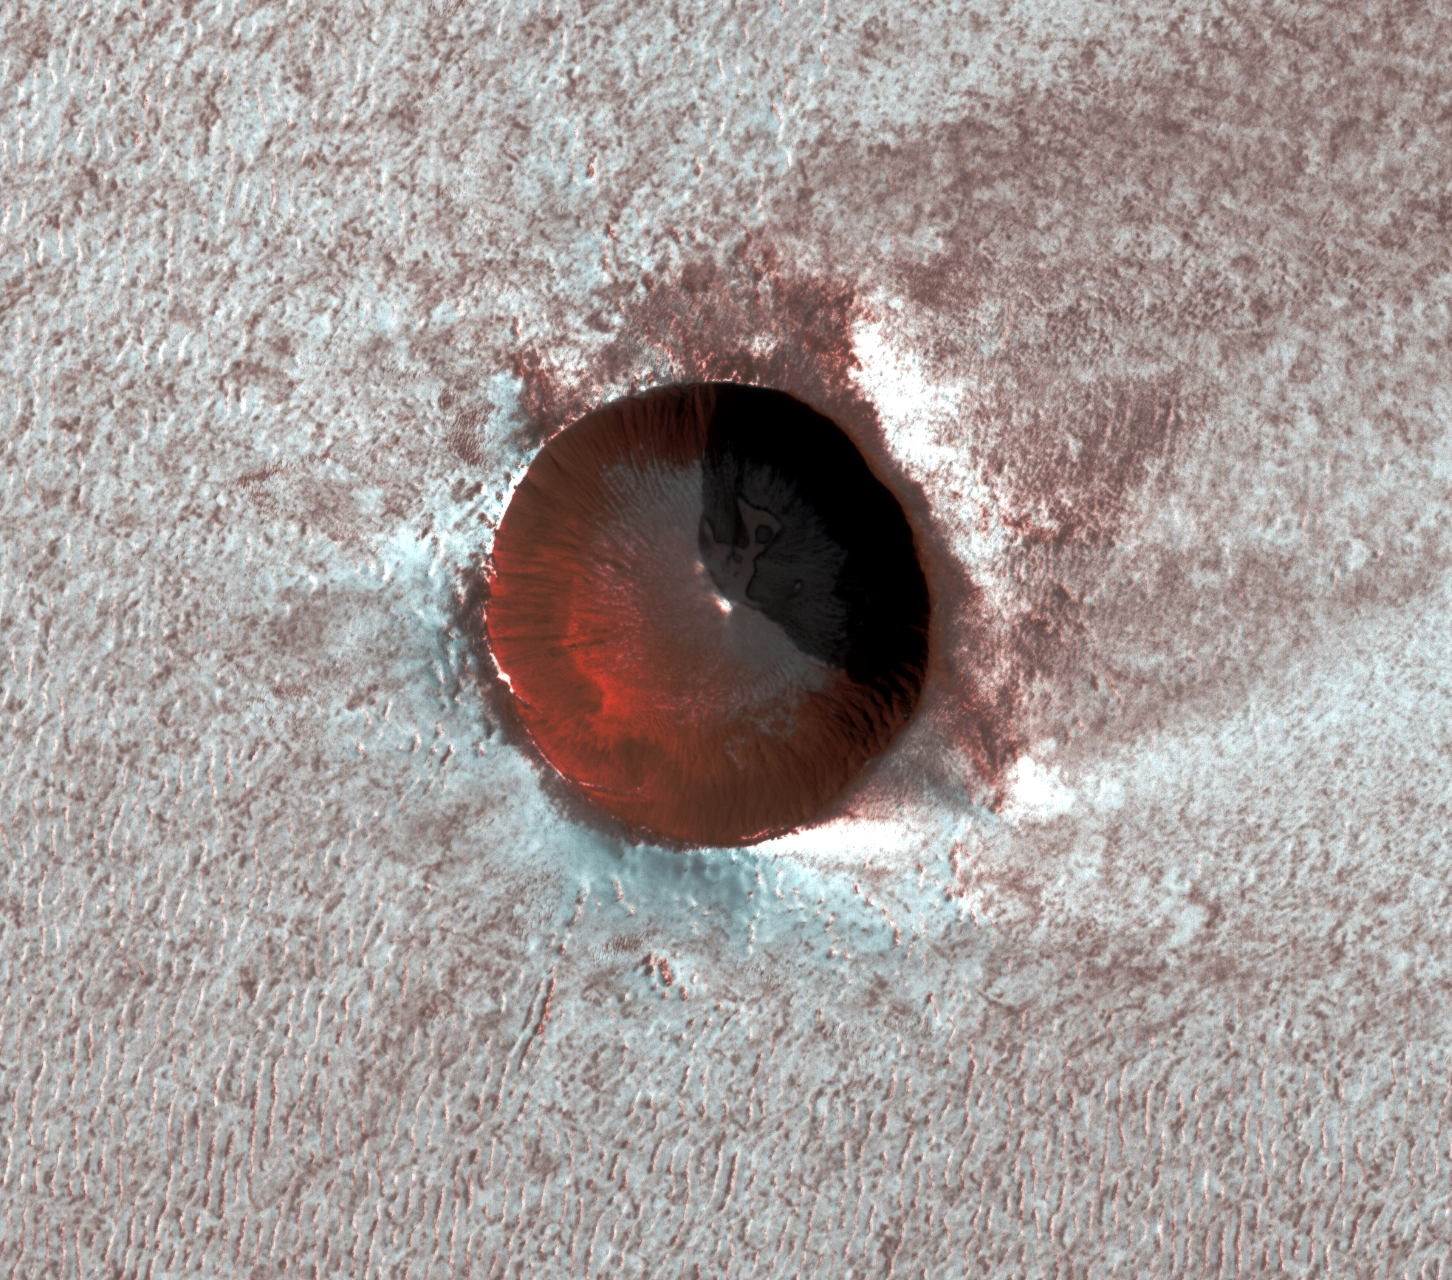 planet mars saint marcel cave xdr nasa jp l university of arizona